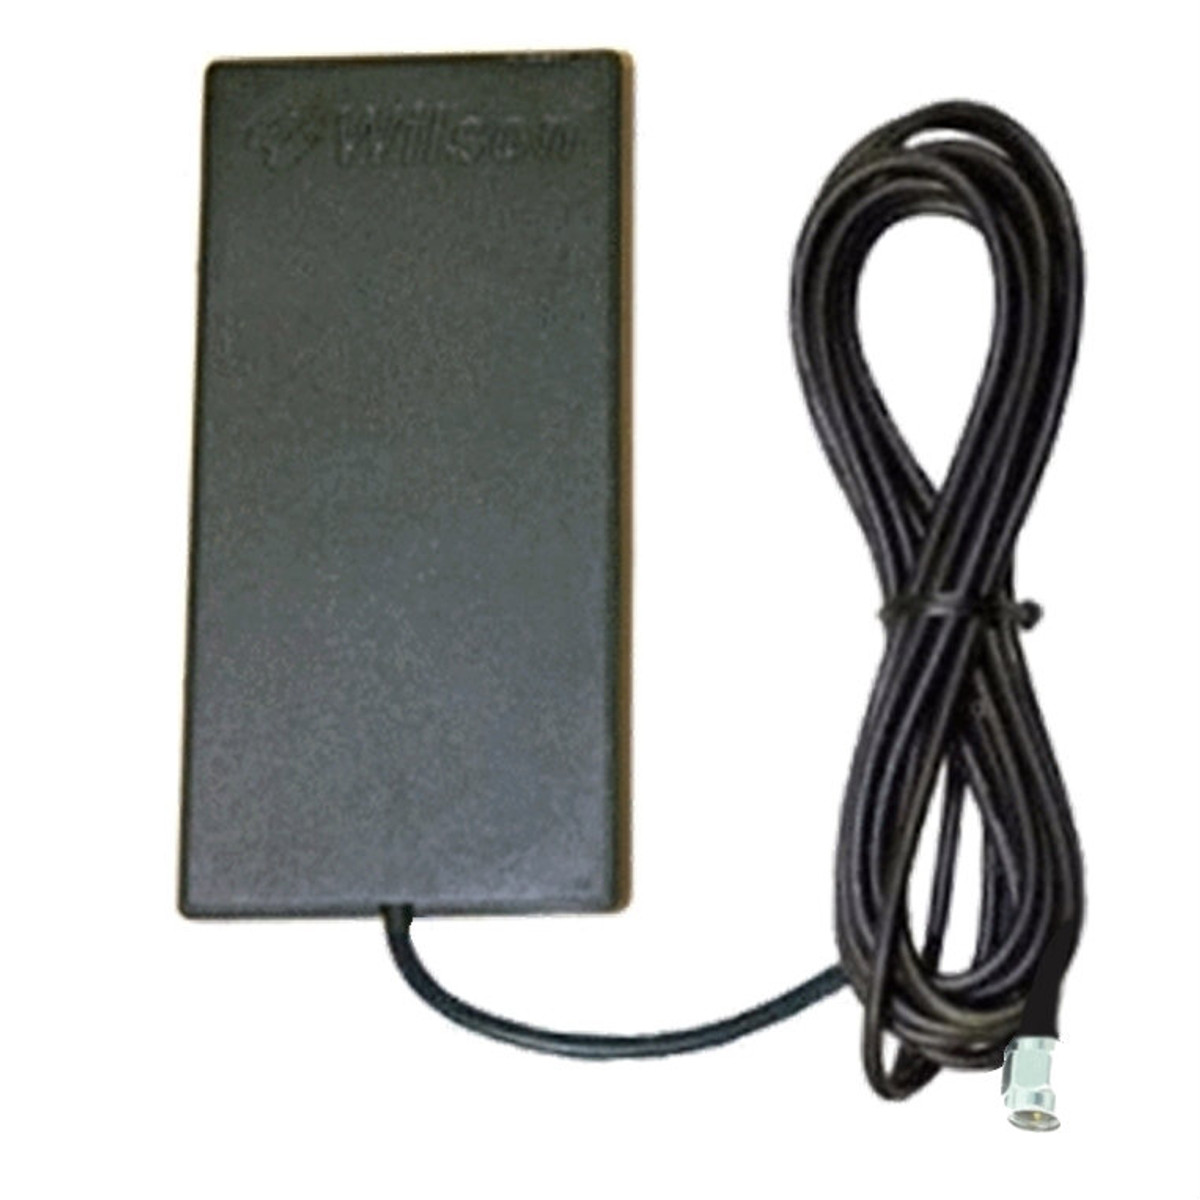 Wilson 301149 Ultra Slim Antenna w/ SMA Connector, main image